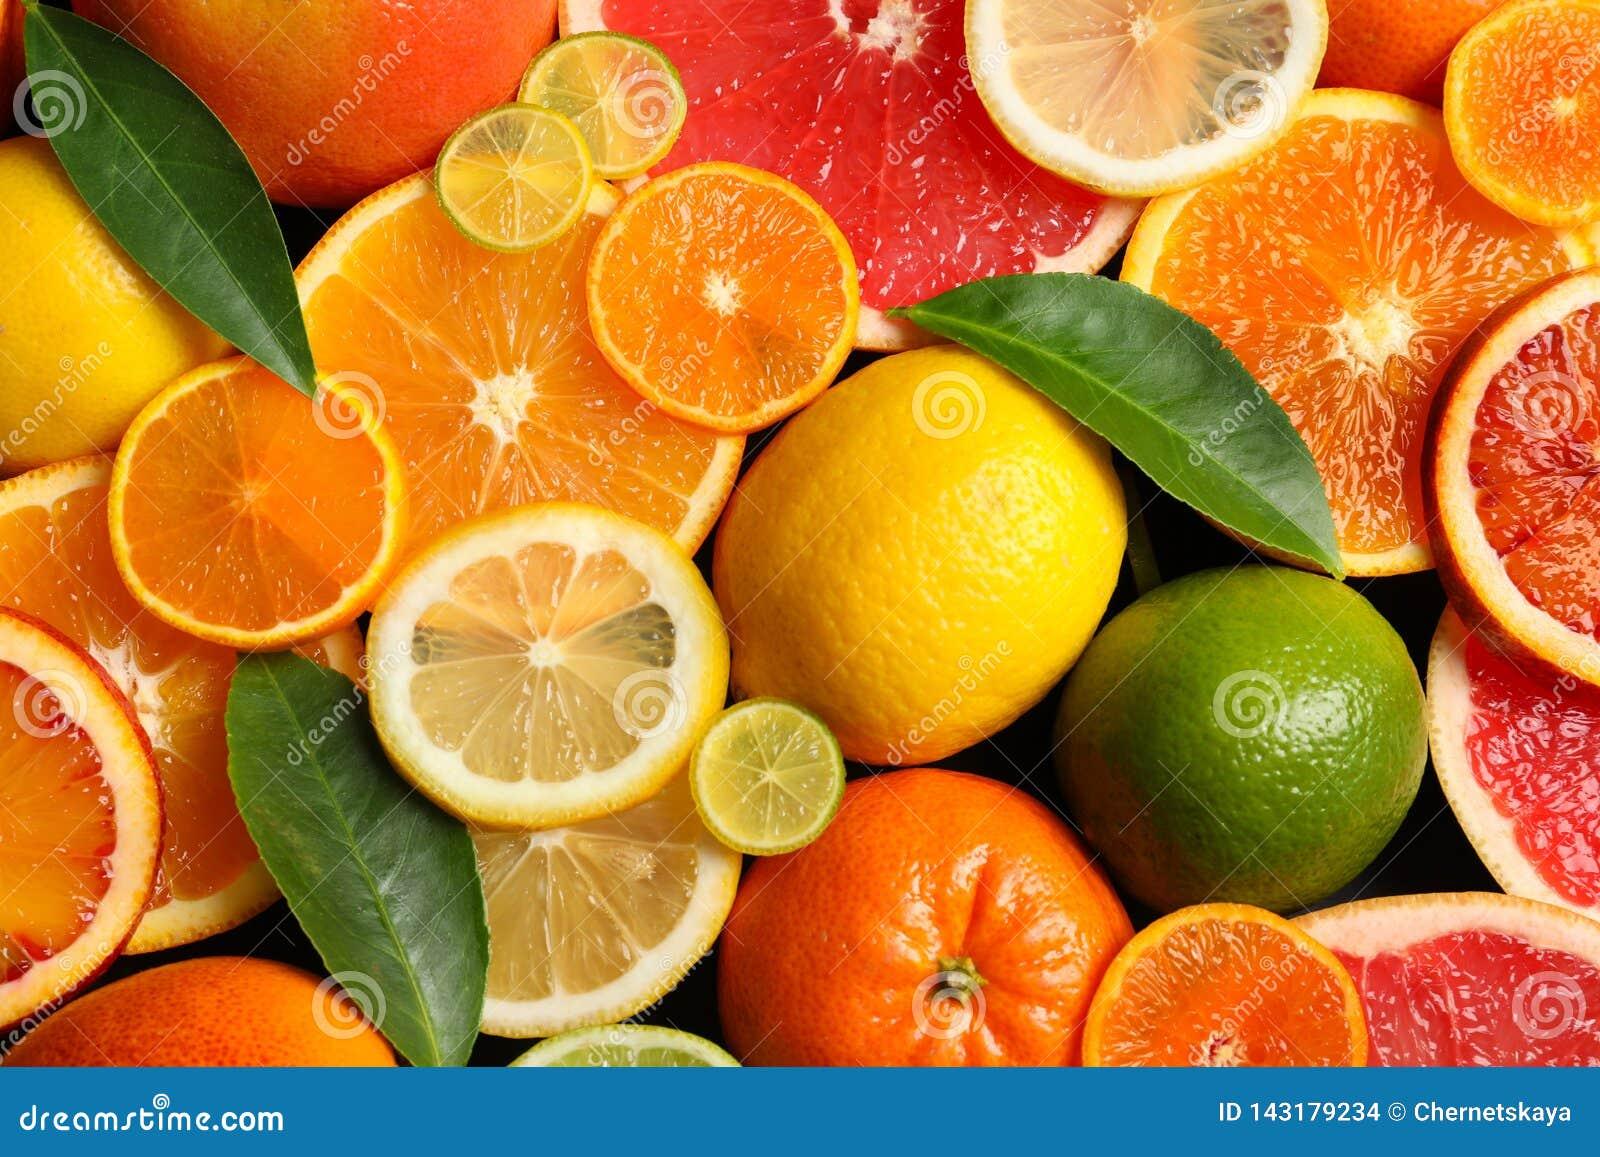 Gesneden en gehele citrusvruchten met bladeren als achtergrond